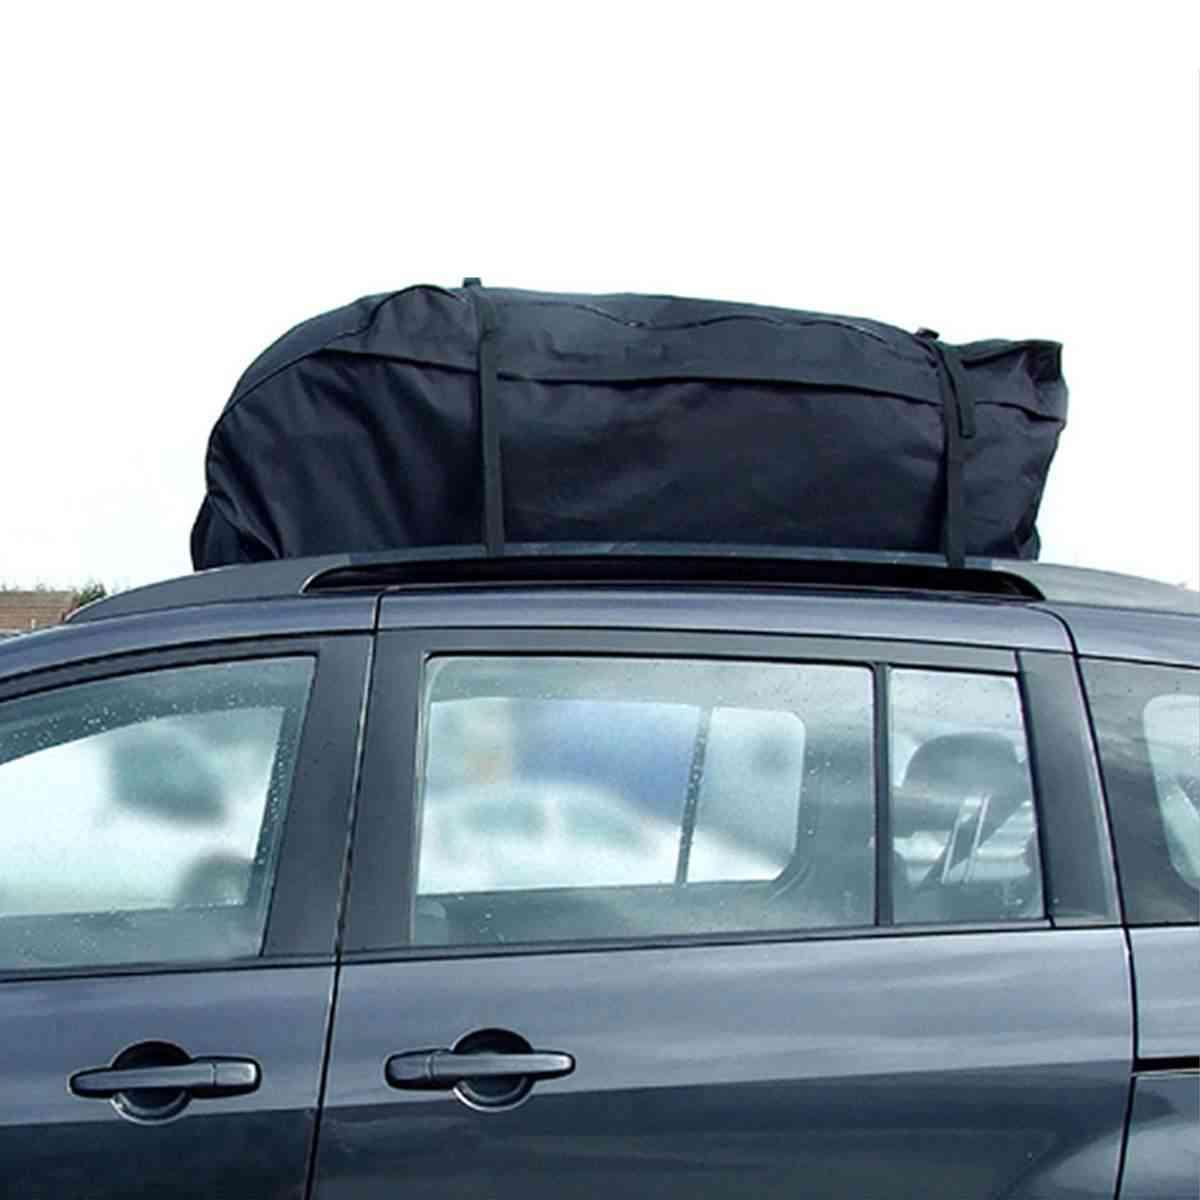 Car Roof Top Bag  Rack Cargo (black)